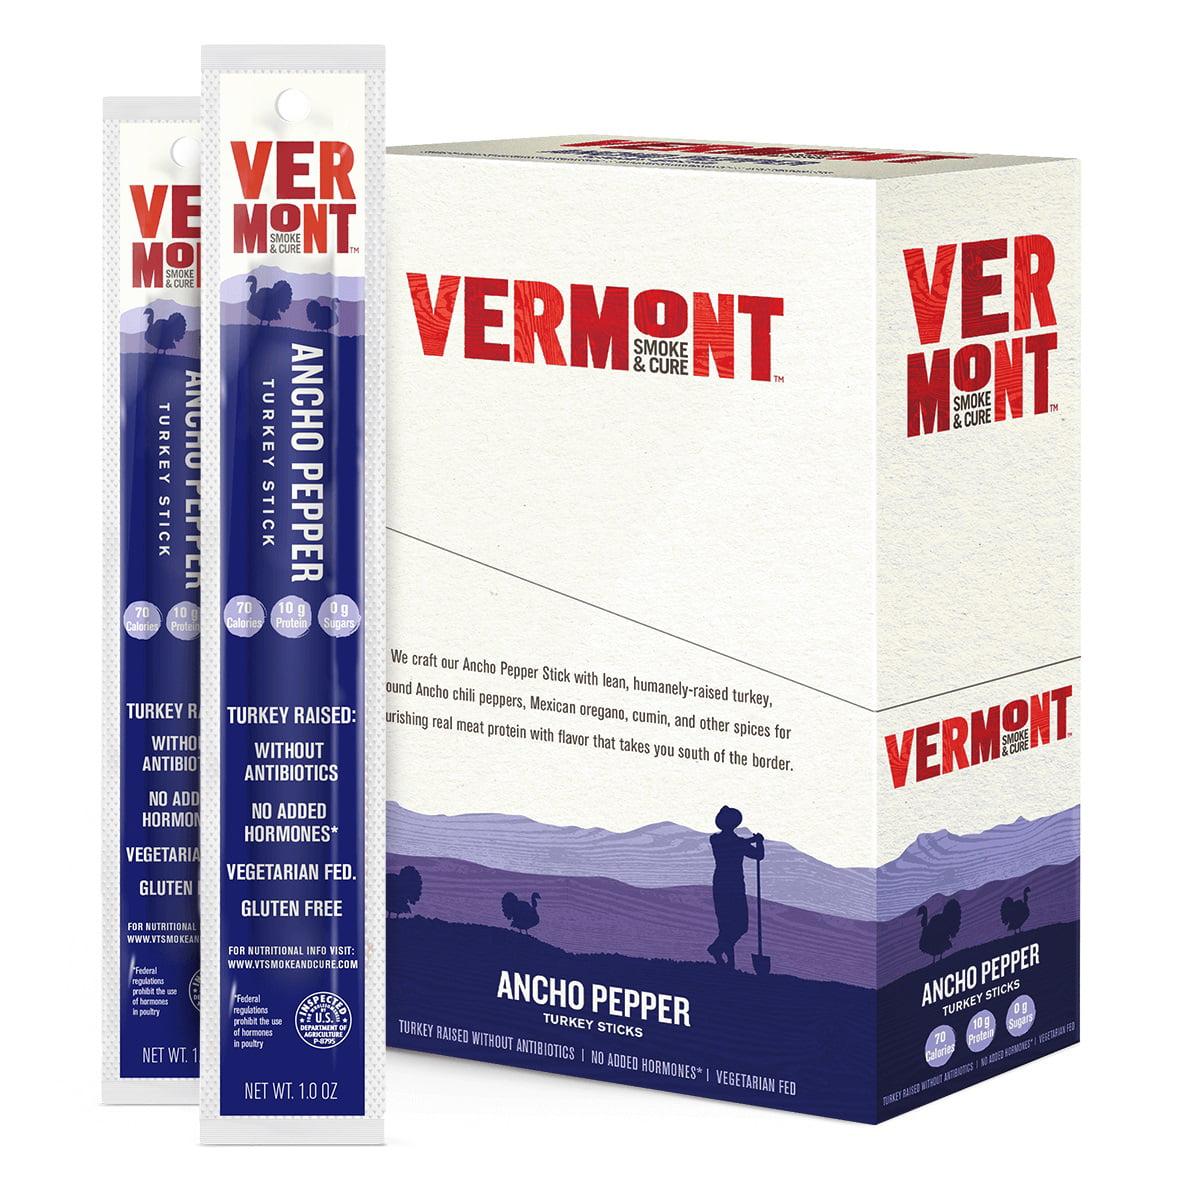 Vermont Smoke & Cure Meat Sticks, Turkey, Antibiotic Free, Gluten Free, Ancho Pepper, 1oz Stick, 24 Count